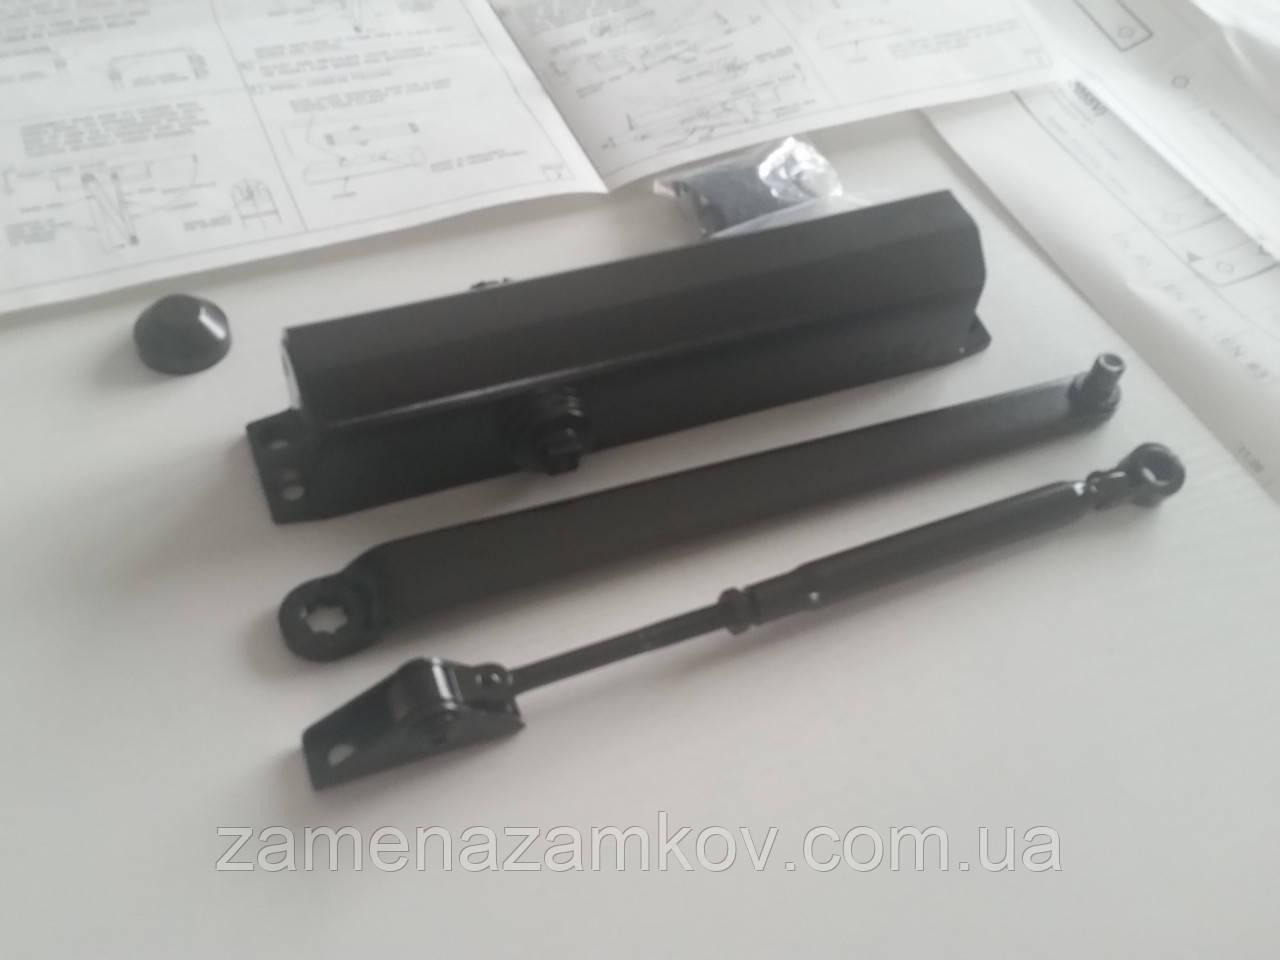 Доводчик RYOBI D-2005V STD BC до 100кг темно-бронзовый (Япония)